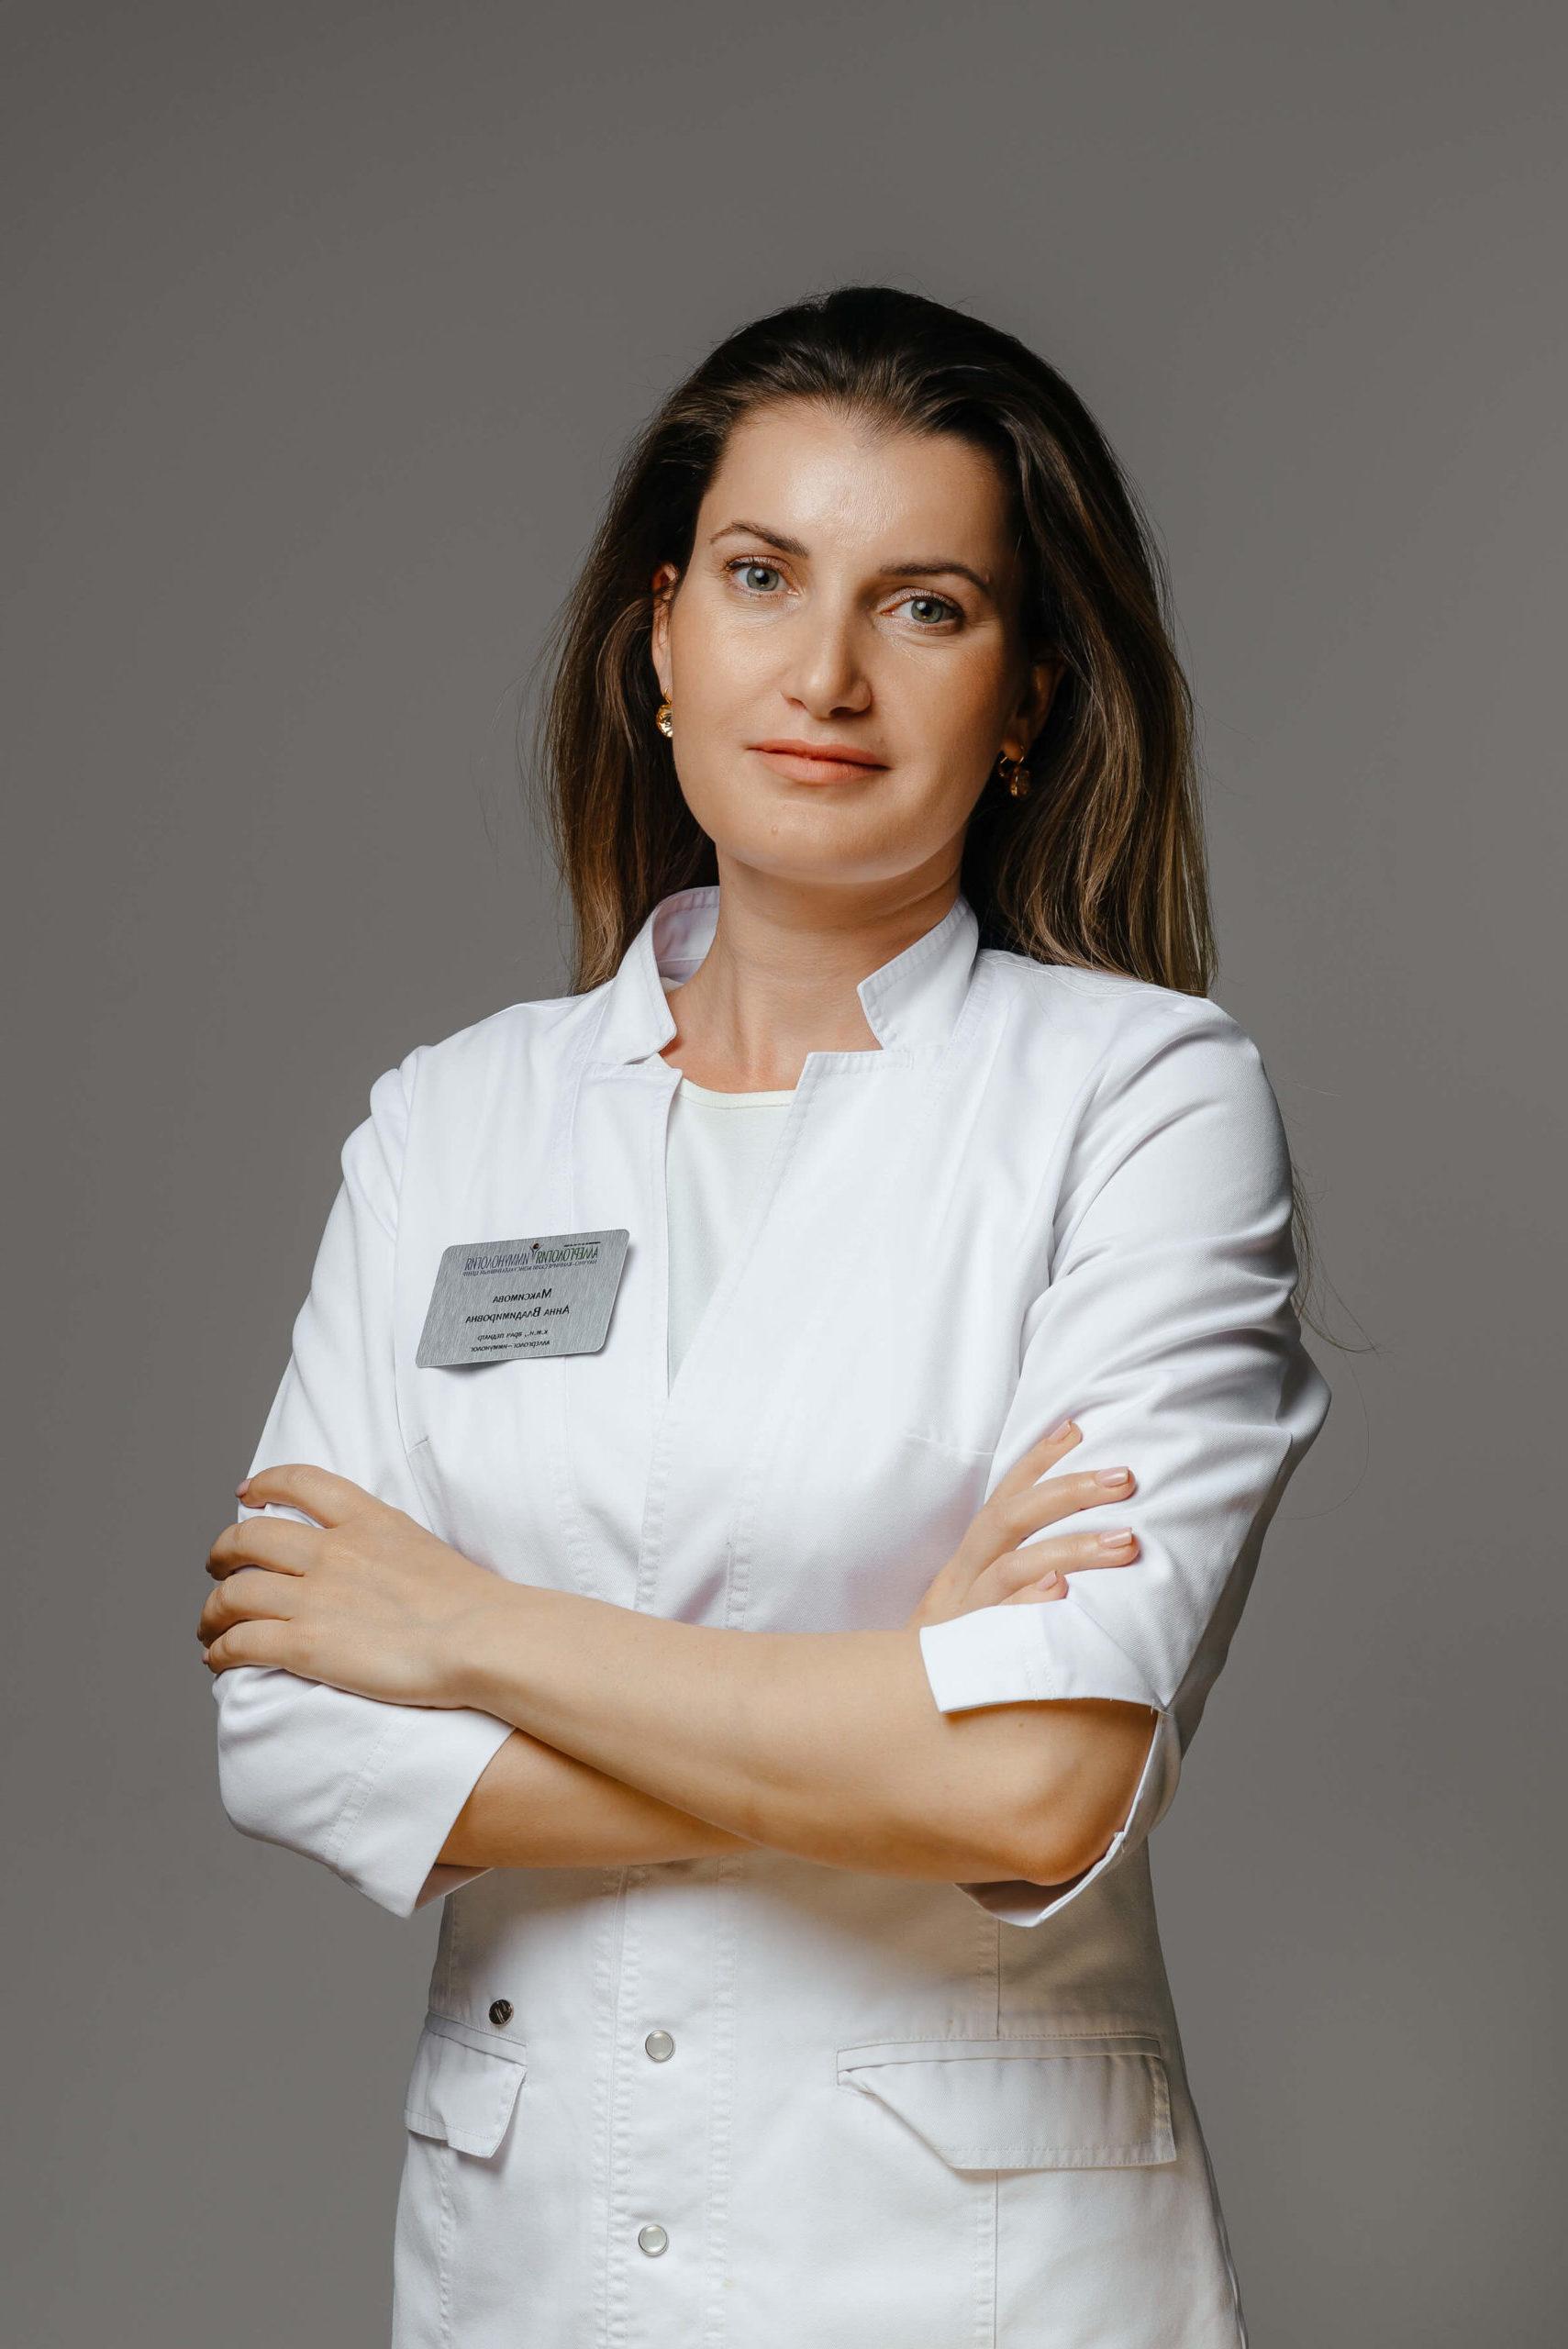 Максимова Анна Владимировна